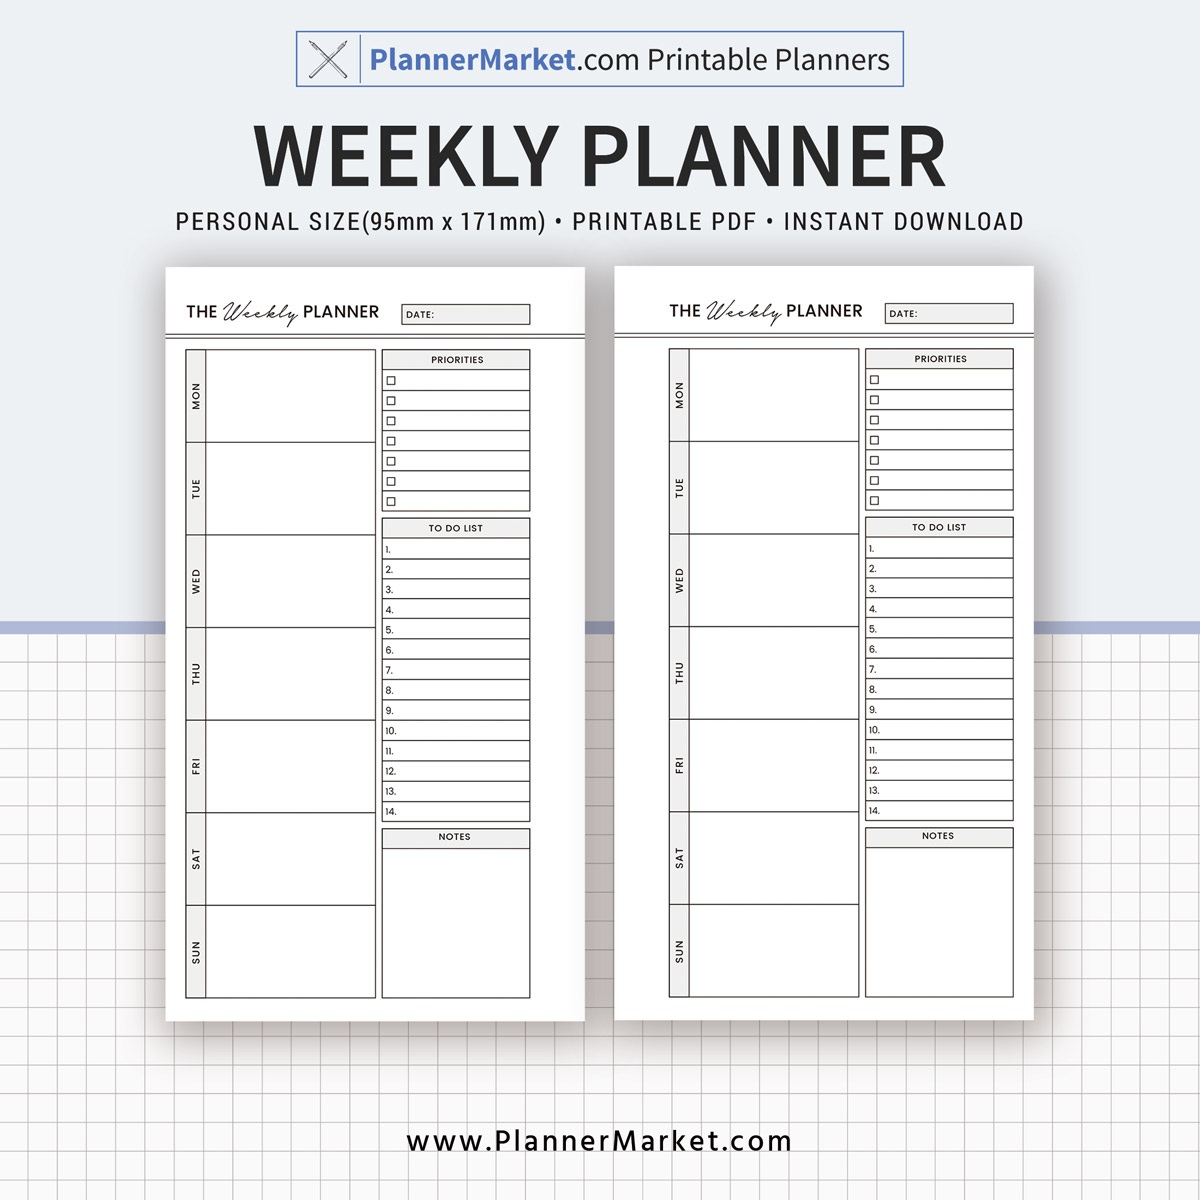 image regarding Blank Weekly Schedule Pdf named Weekly Planner, 2019 Planner Inserts, Individual Dimension Planner, Planner Refill, Planner Binder, Printable PDF, Instantaneous Obtain